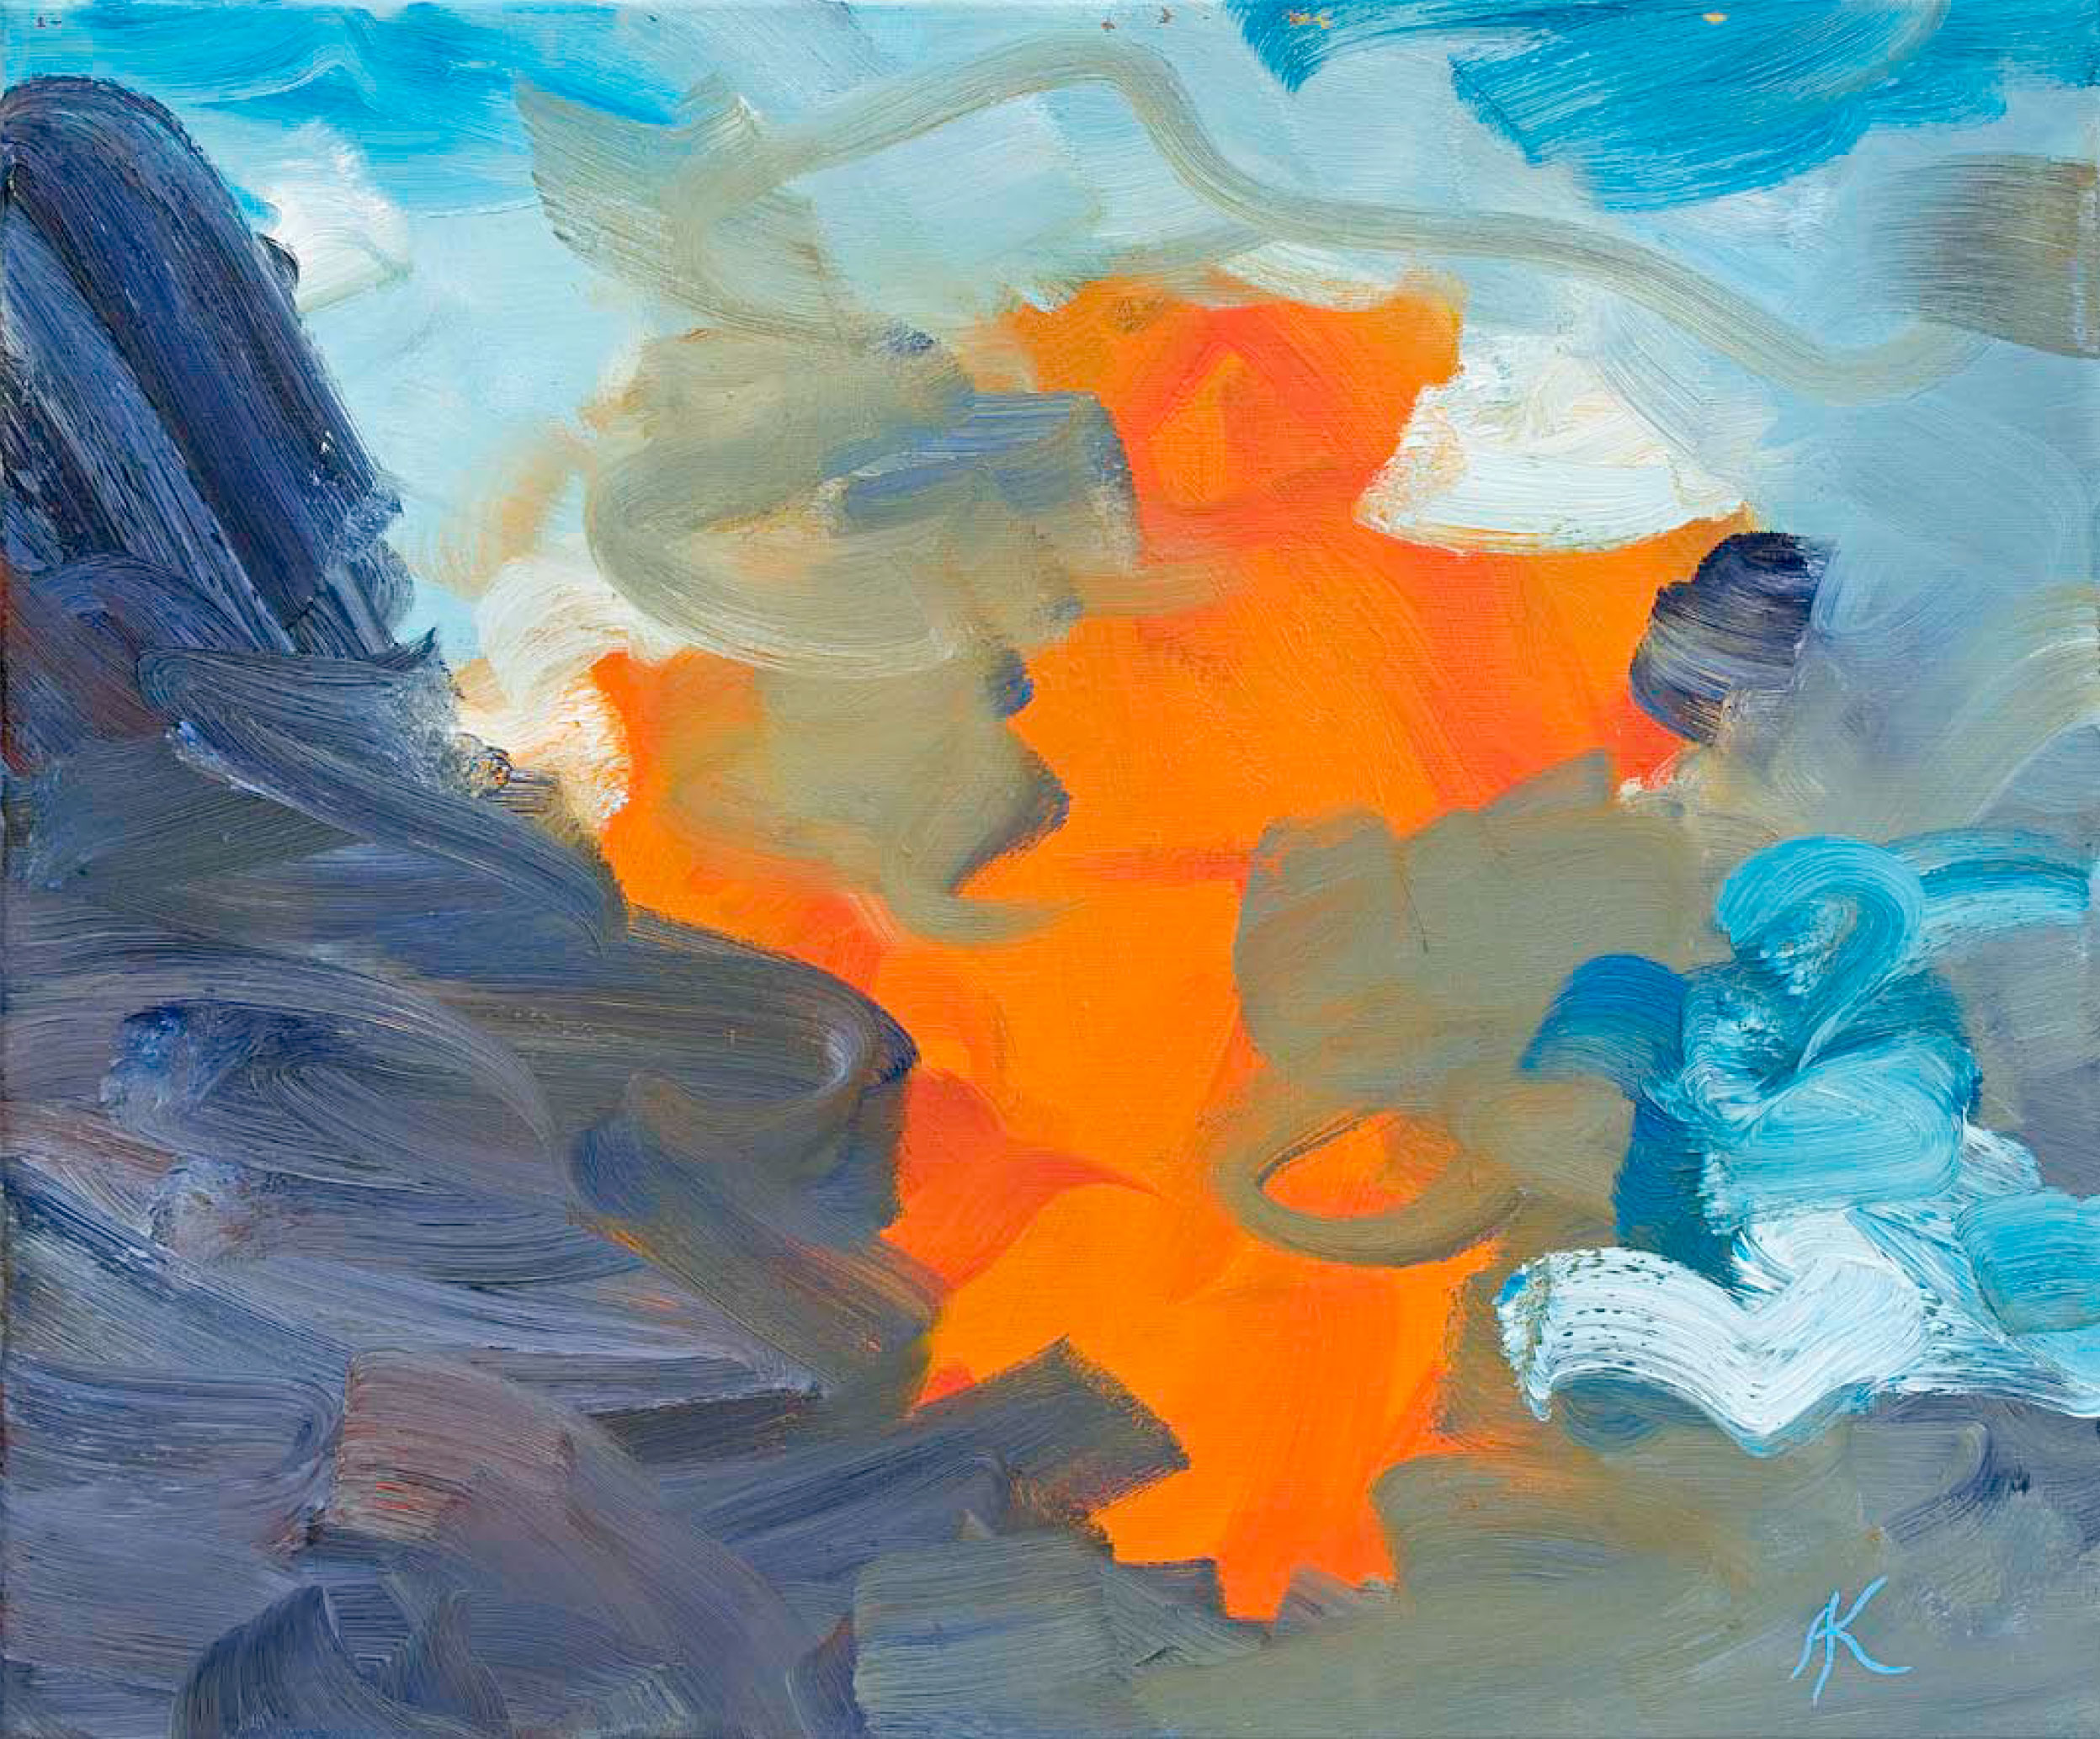 Spielfeld VII, 2001, Öl auf Leinwand, 60 x 50 cm